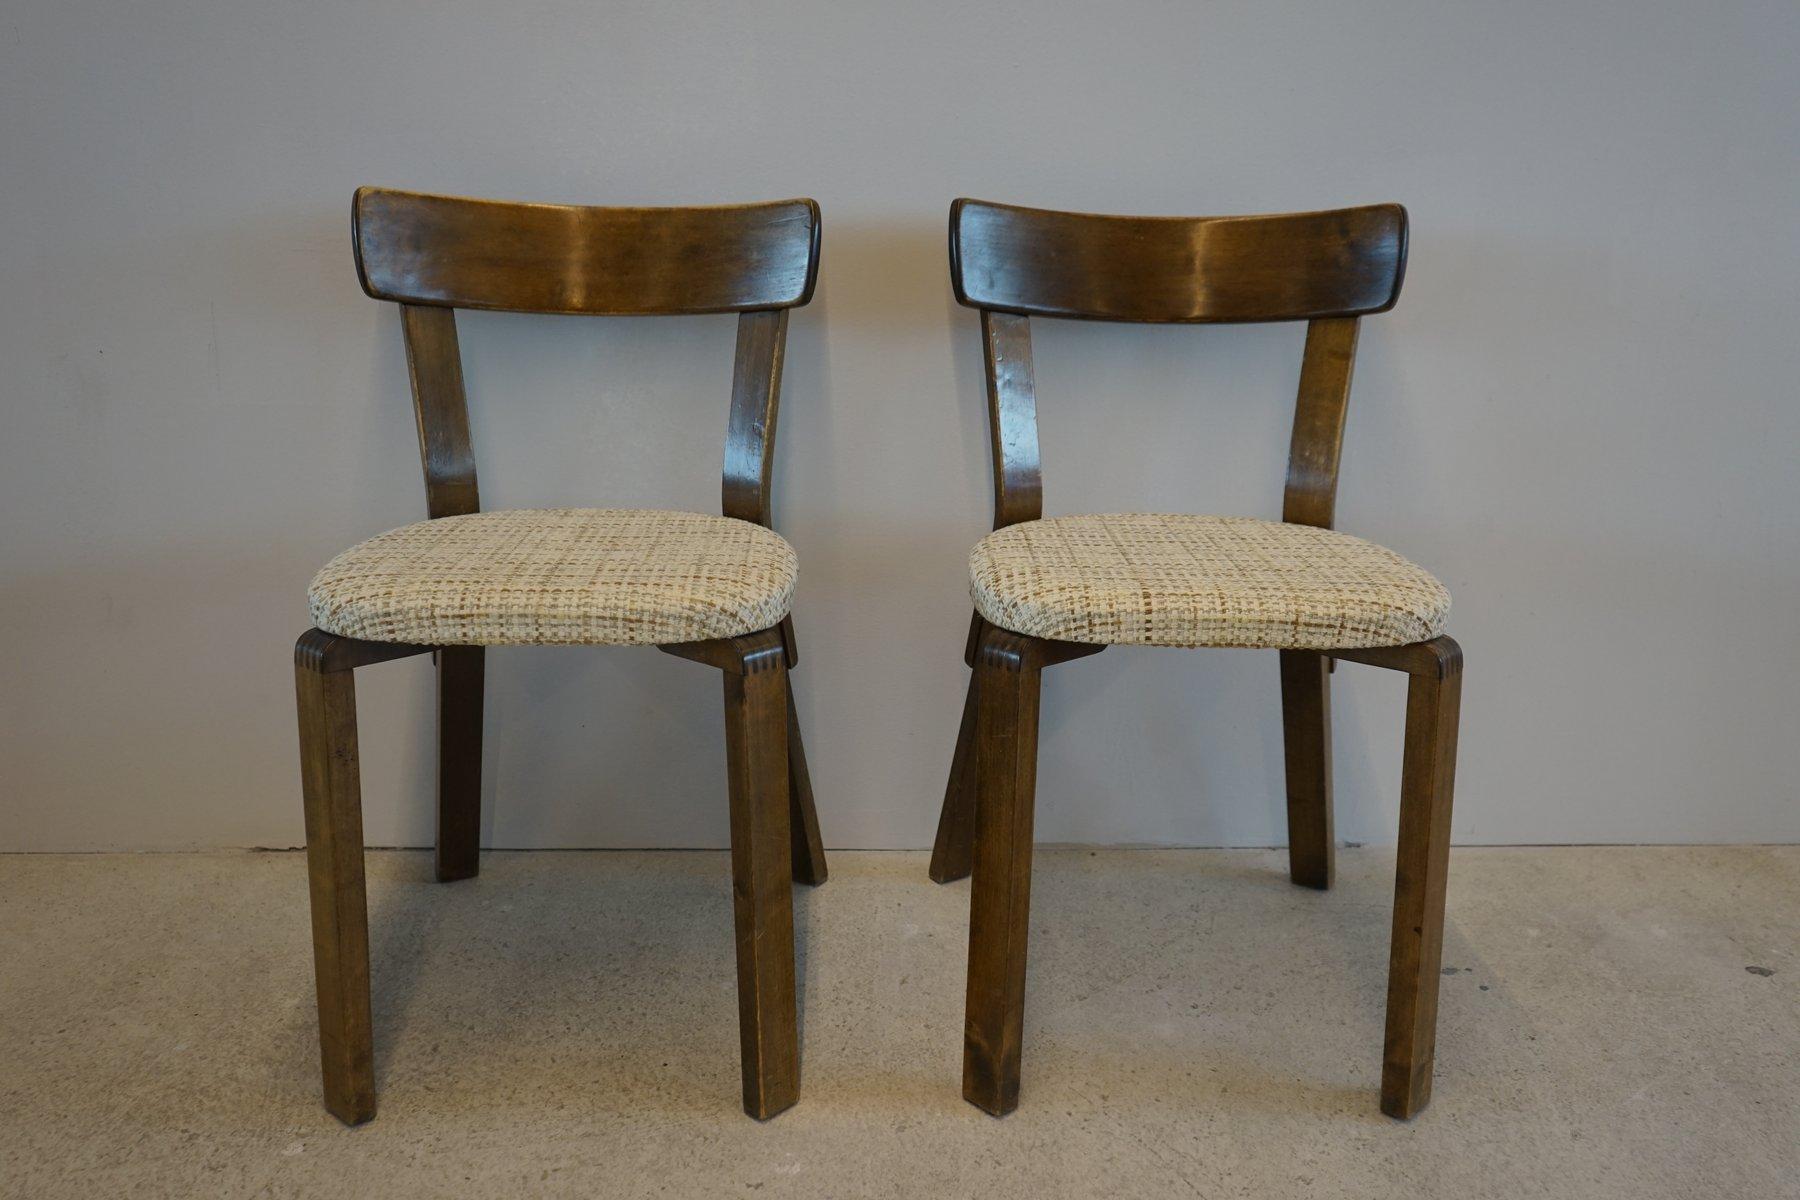 Prewar chair 69 by alvar aalto for artek 1940s for sale for Alvar aalto chaise